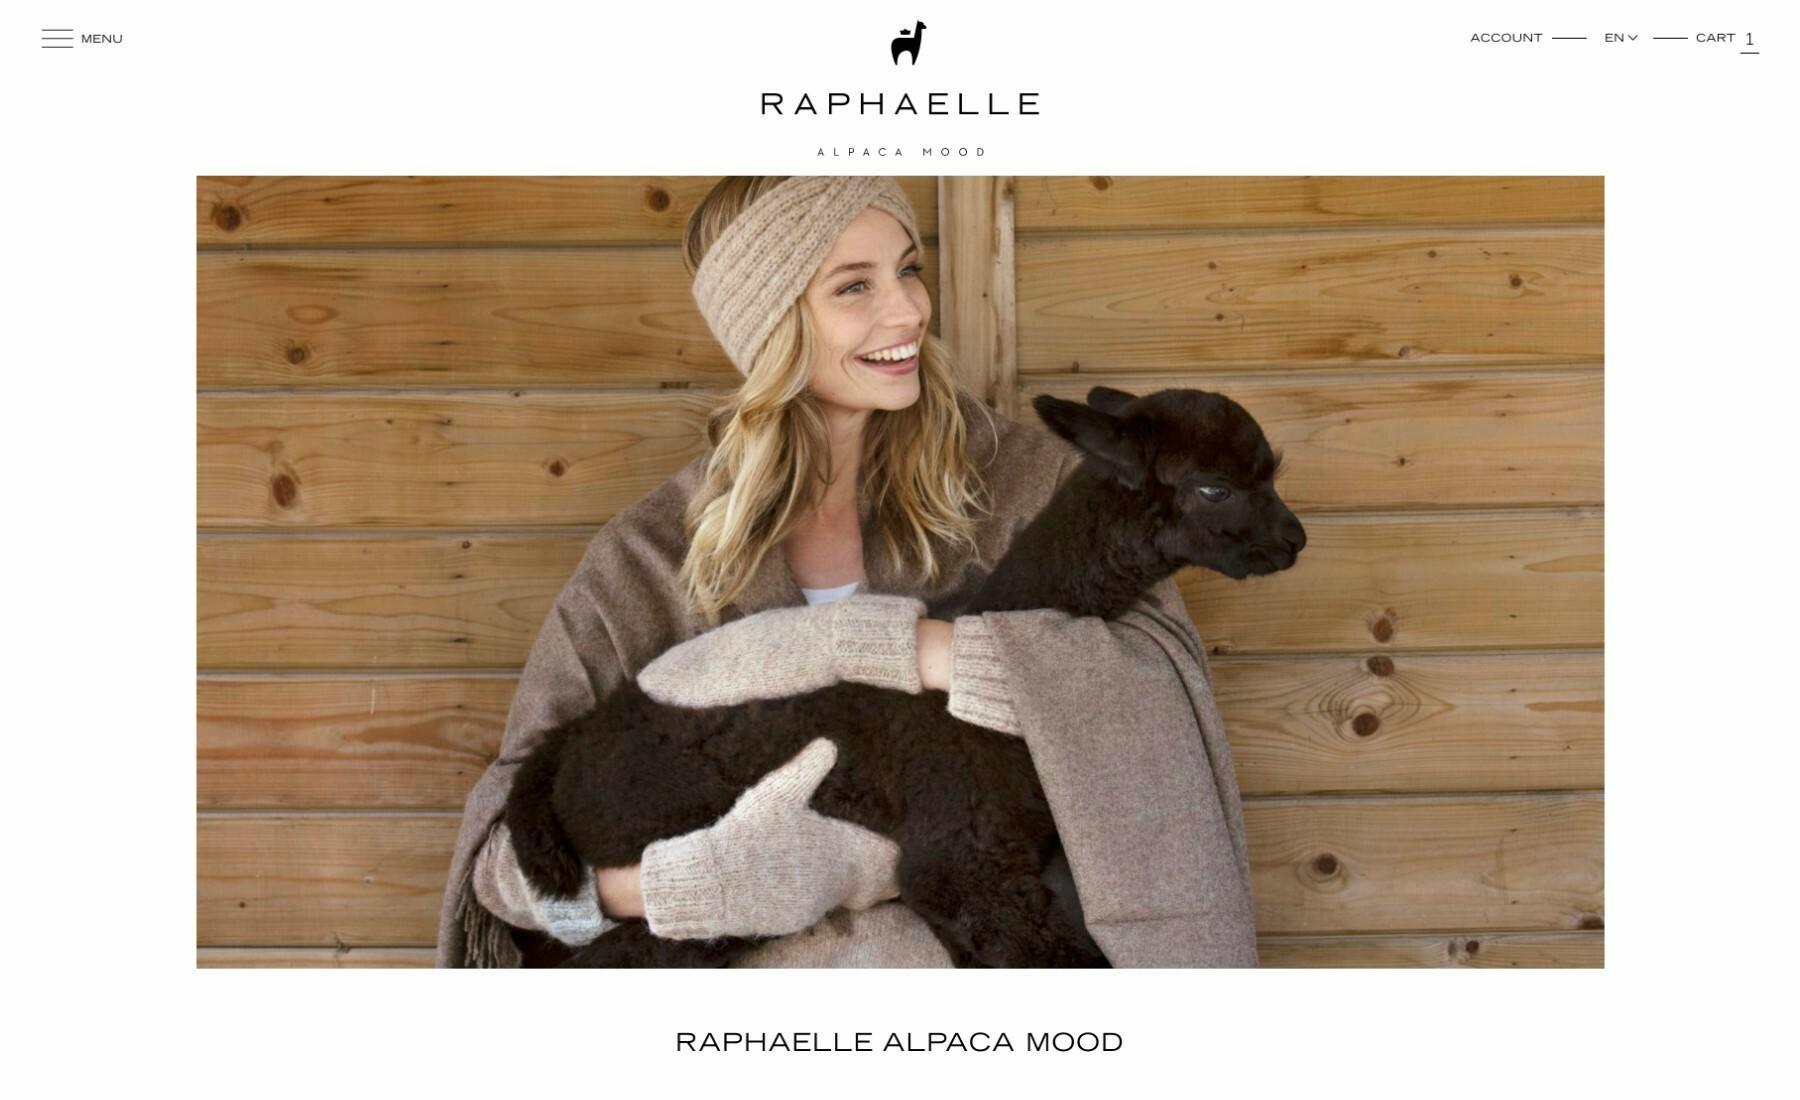 Raphaelle